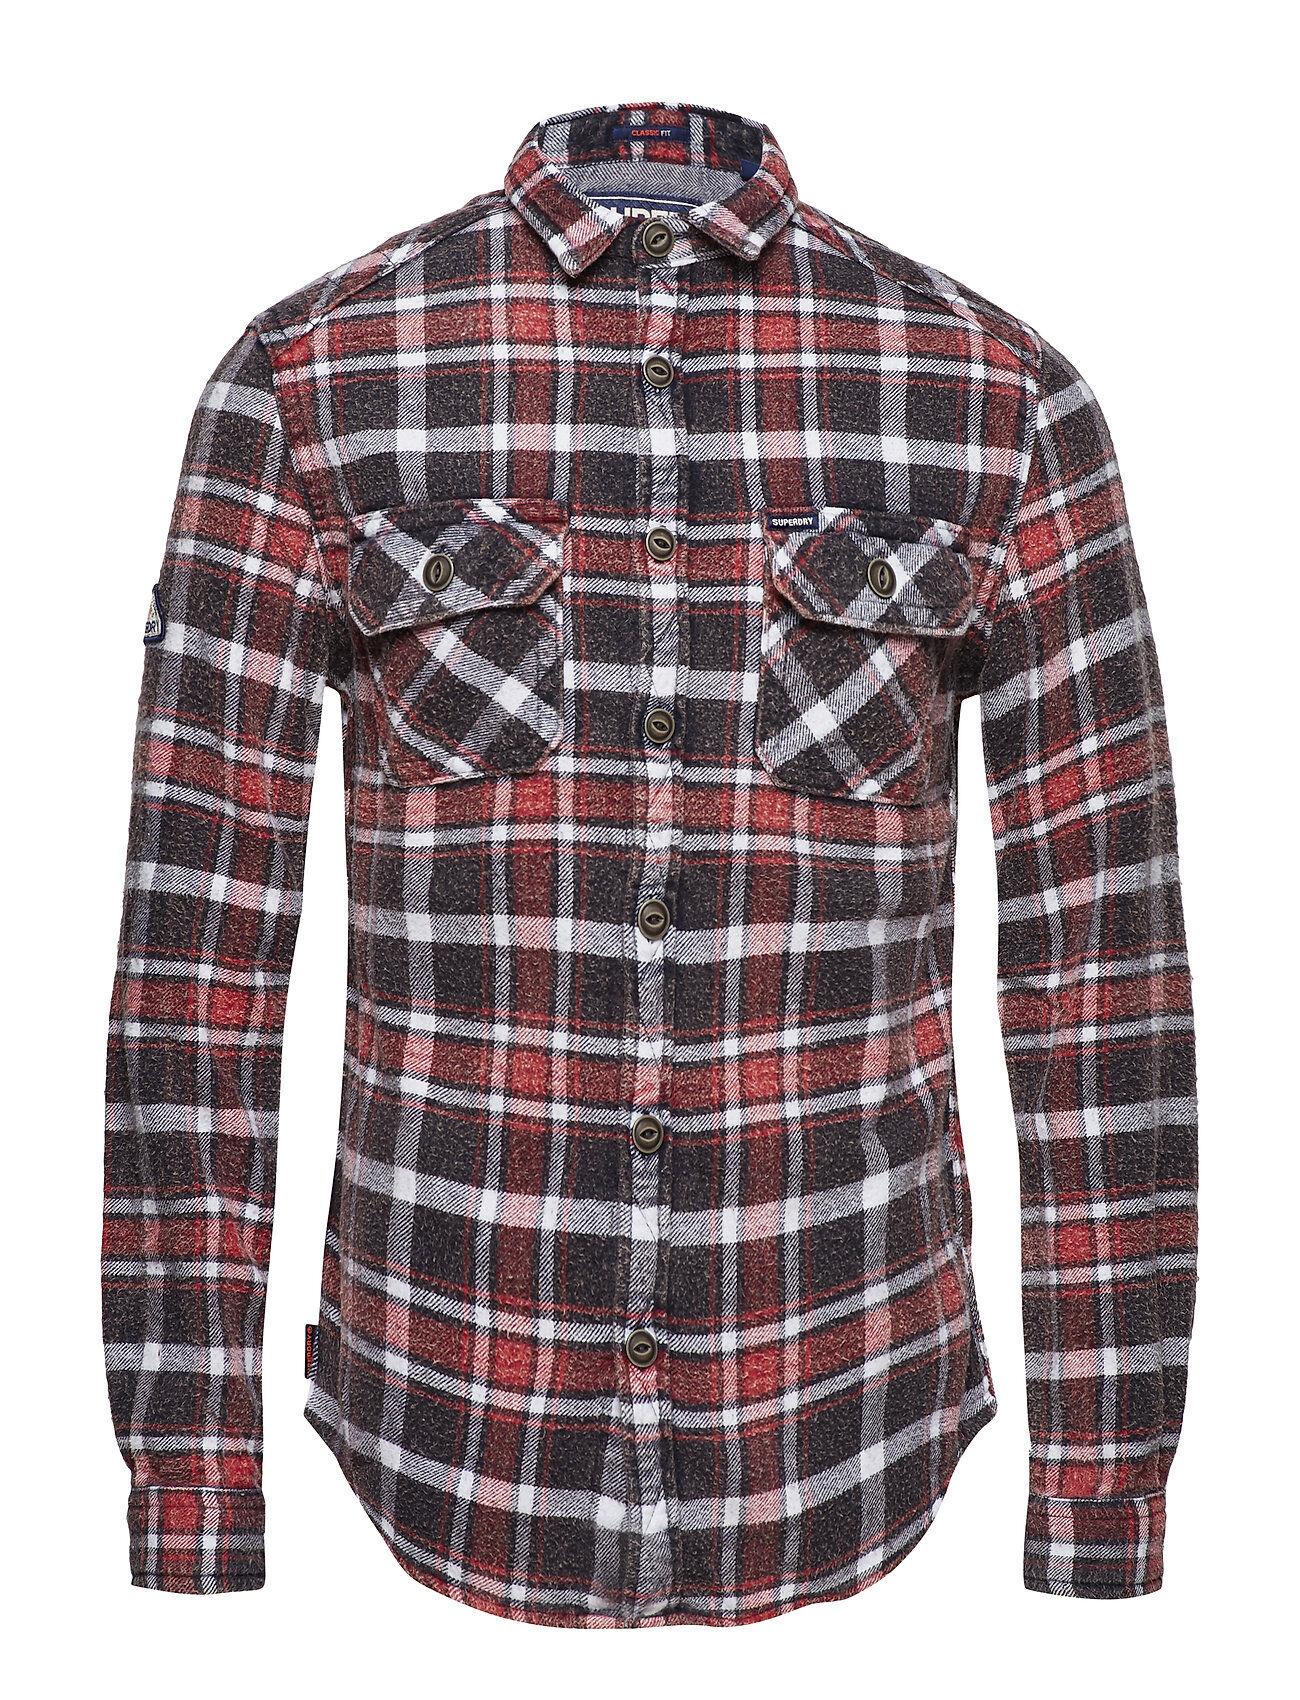 Superdry Merchant Milled Shirt Paita Rento Casual Punainen Superdry